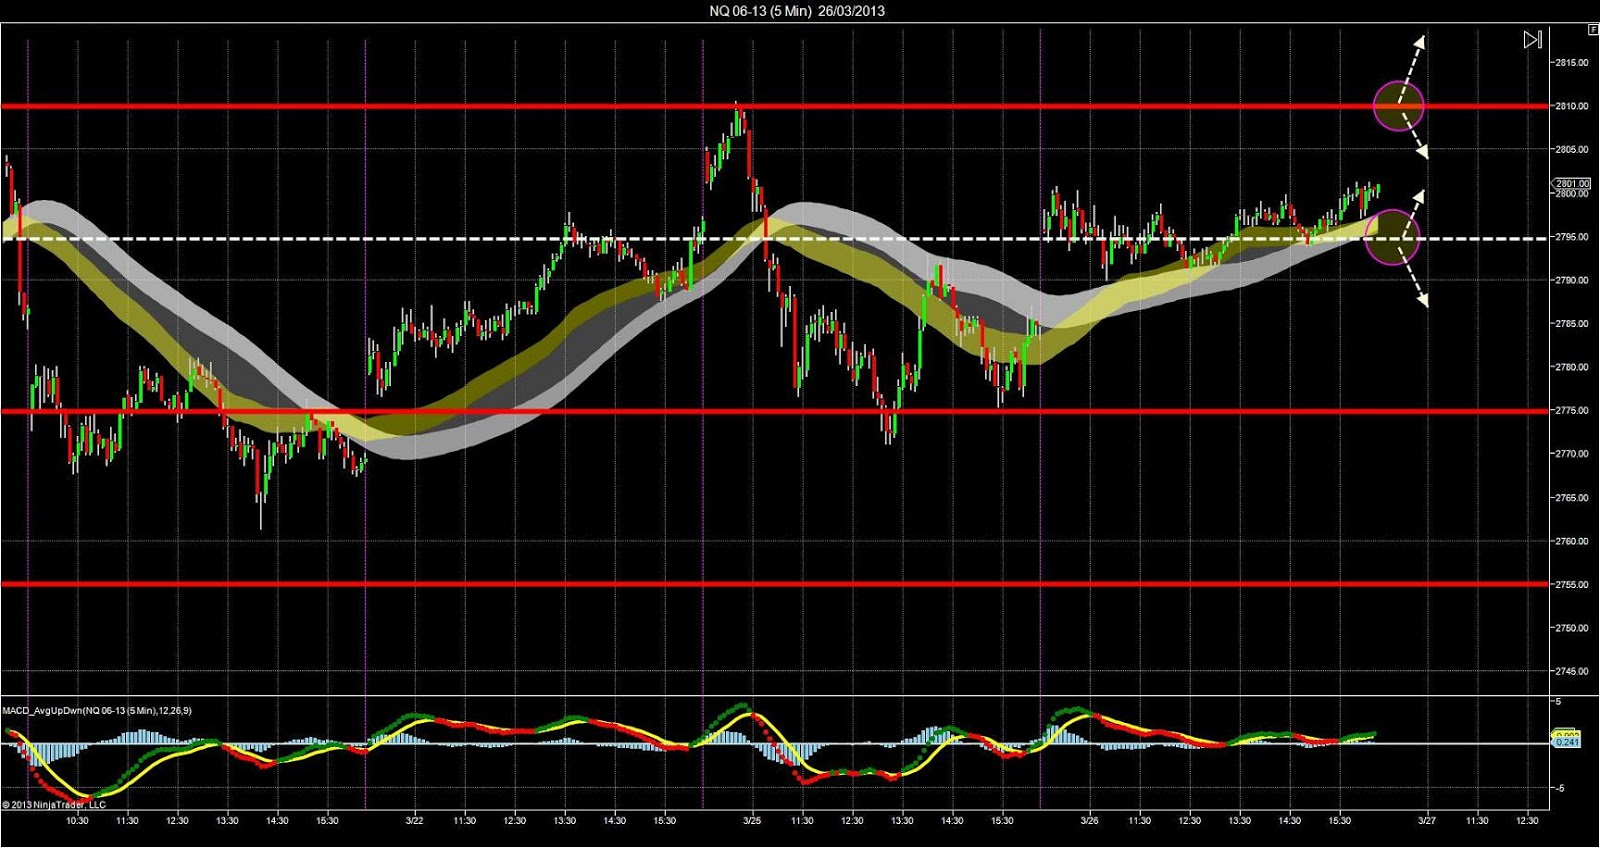 Trading Fast Impulsive Trends Trading Guideline For